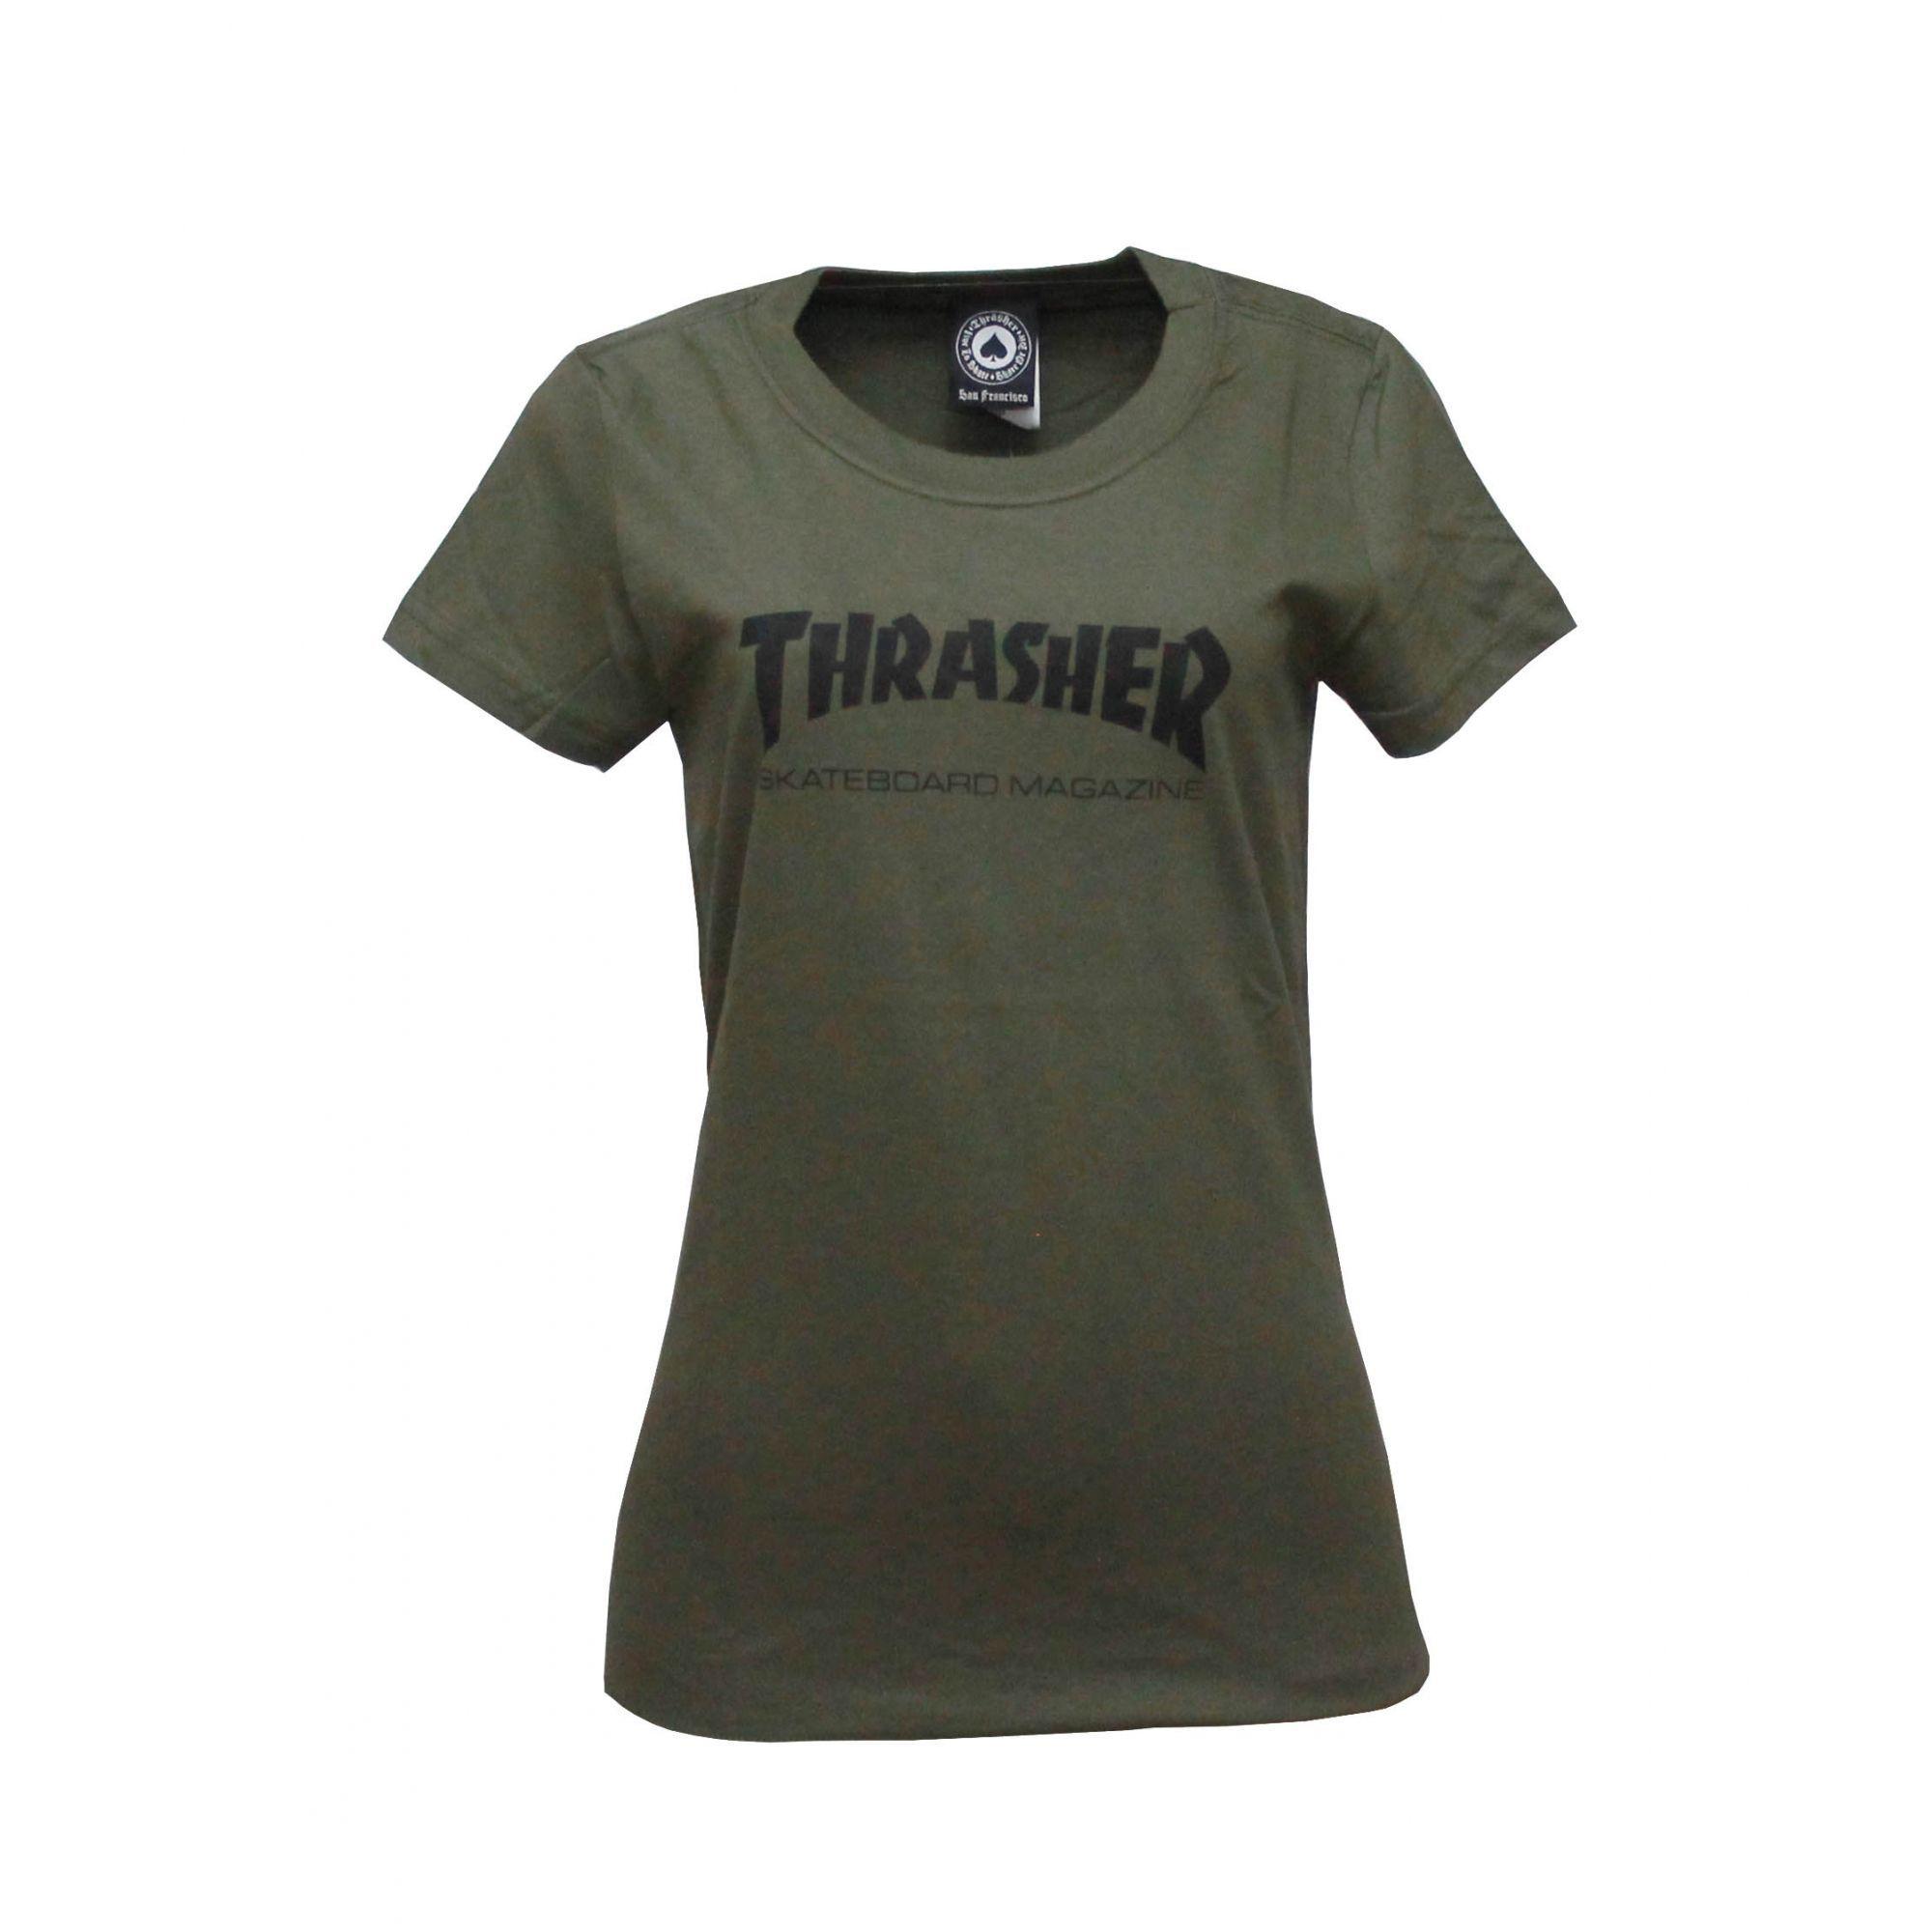 Camiseta Feminina Thrasher Magazine Skate Mag - Verde Militar